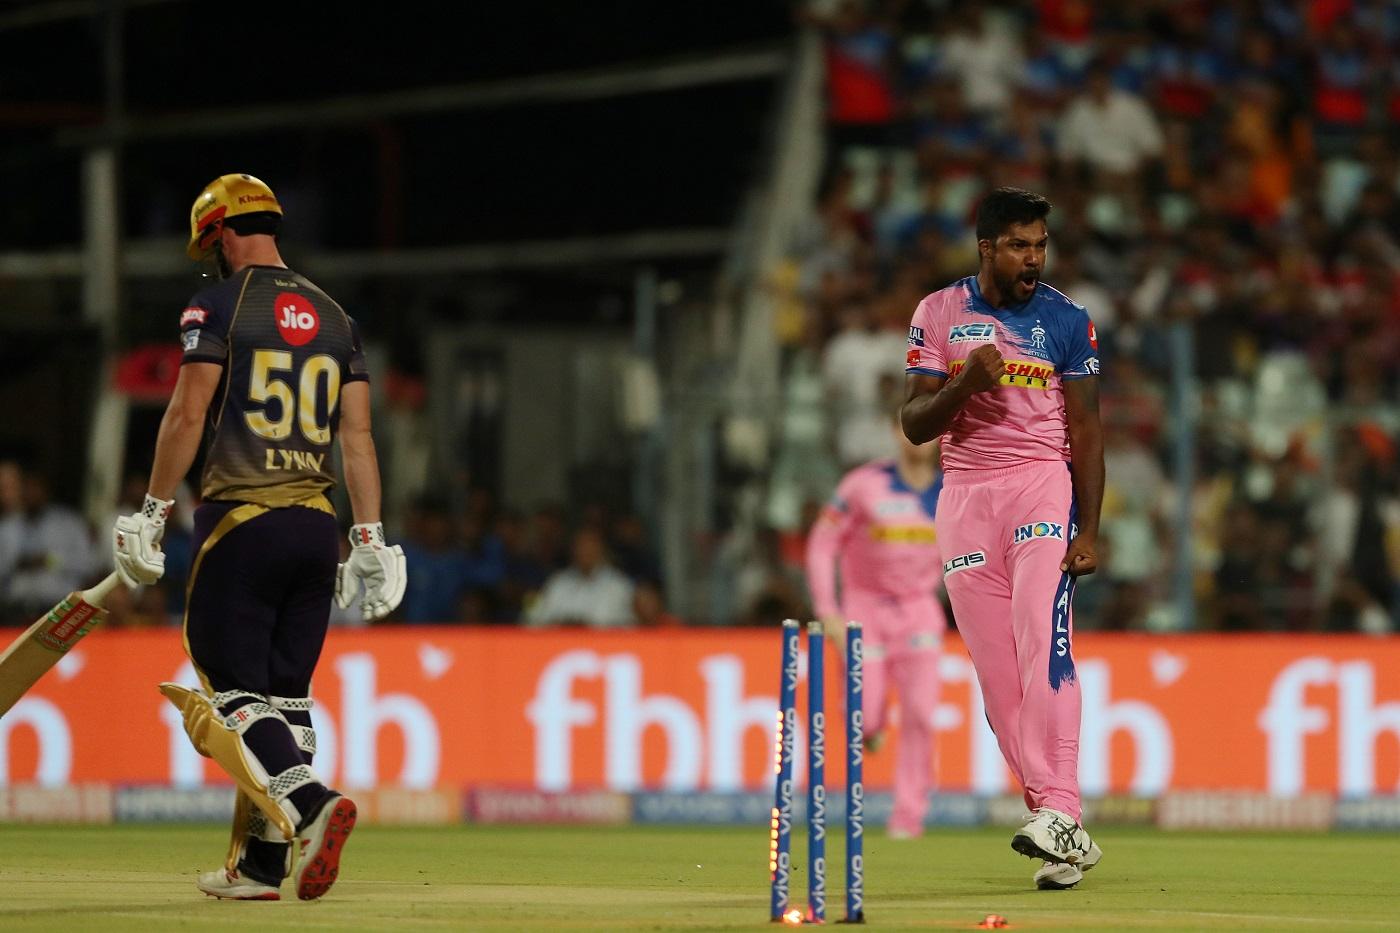 IPL 2019: Match 43, KKR vs RR - Twitter Reacts as Dinesh Karthik Guides Kolkata Knight Riders to 175 Runs 1